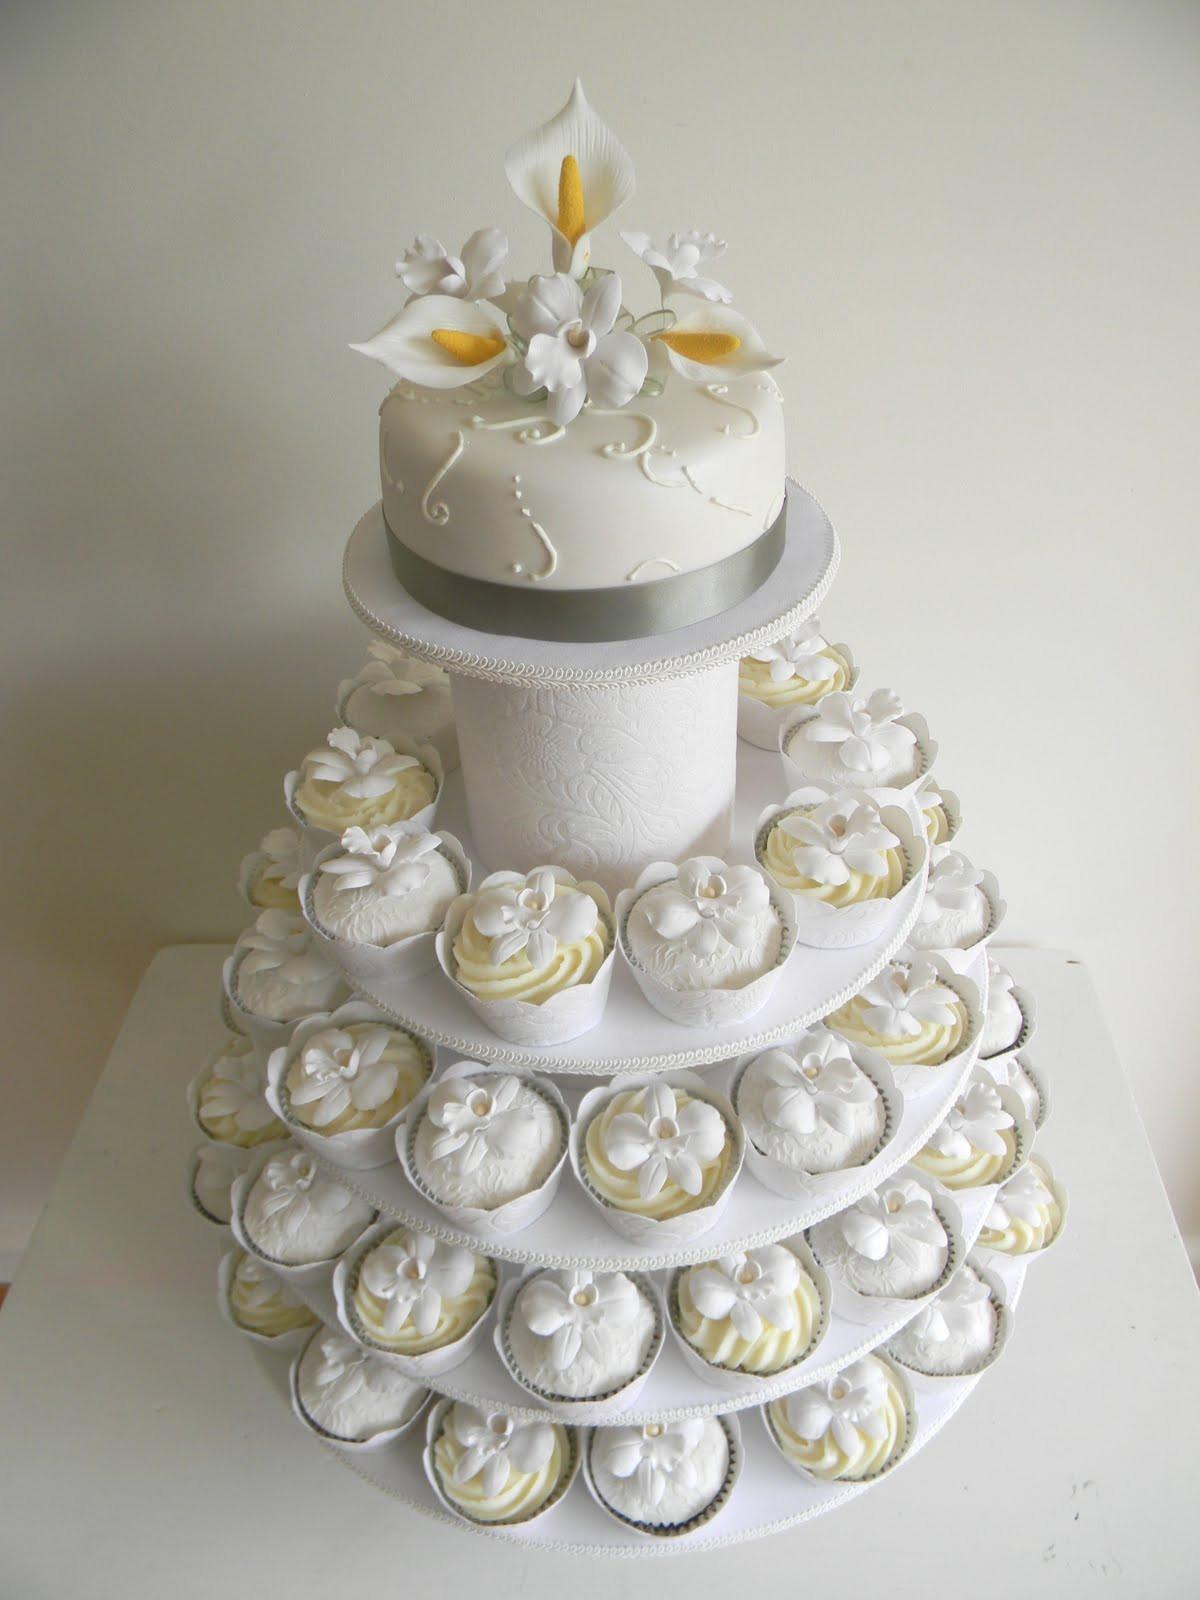 Small Wedding Cakes With Cupcakes  Just call me Martha Celia & Istvan s wedding cake & cupcakes